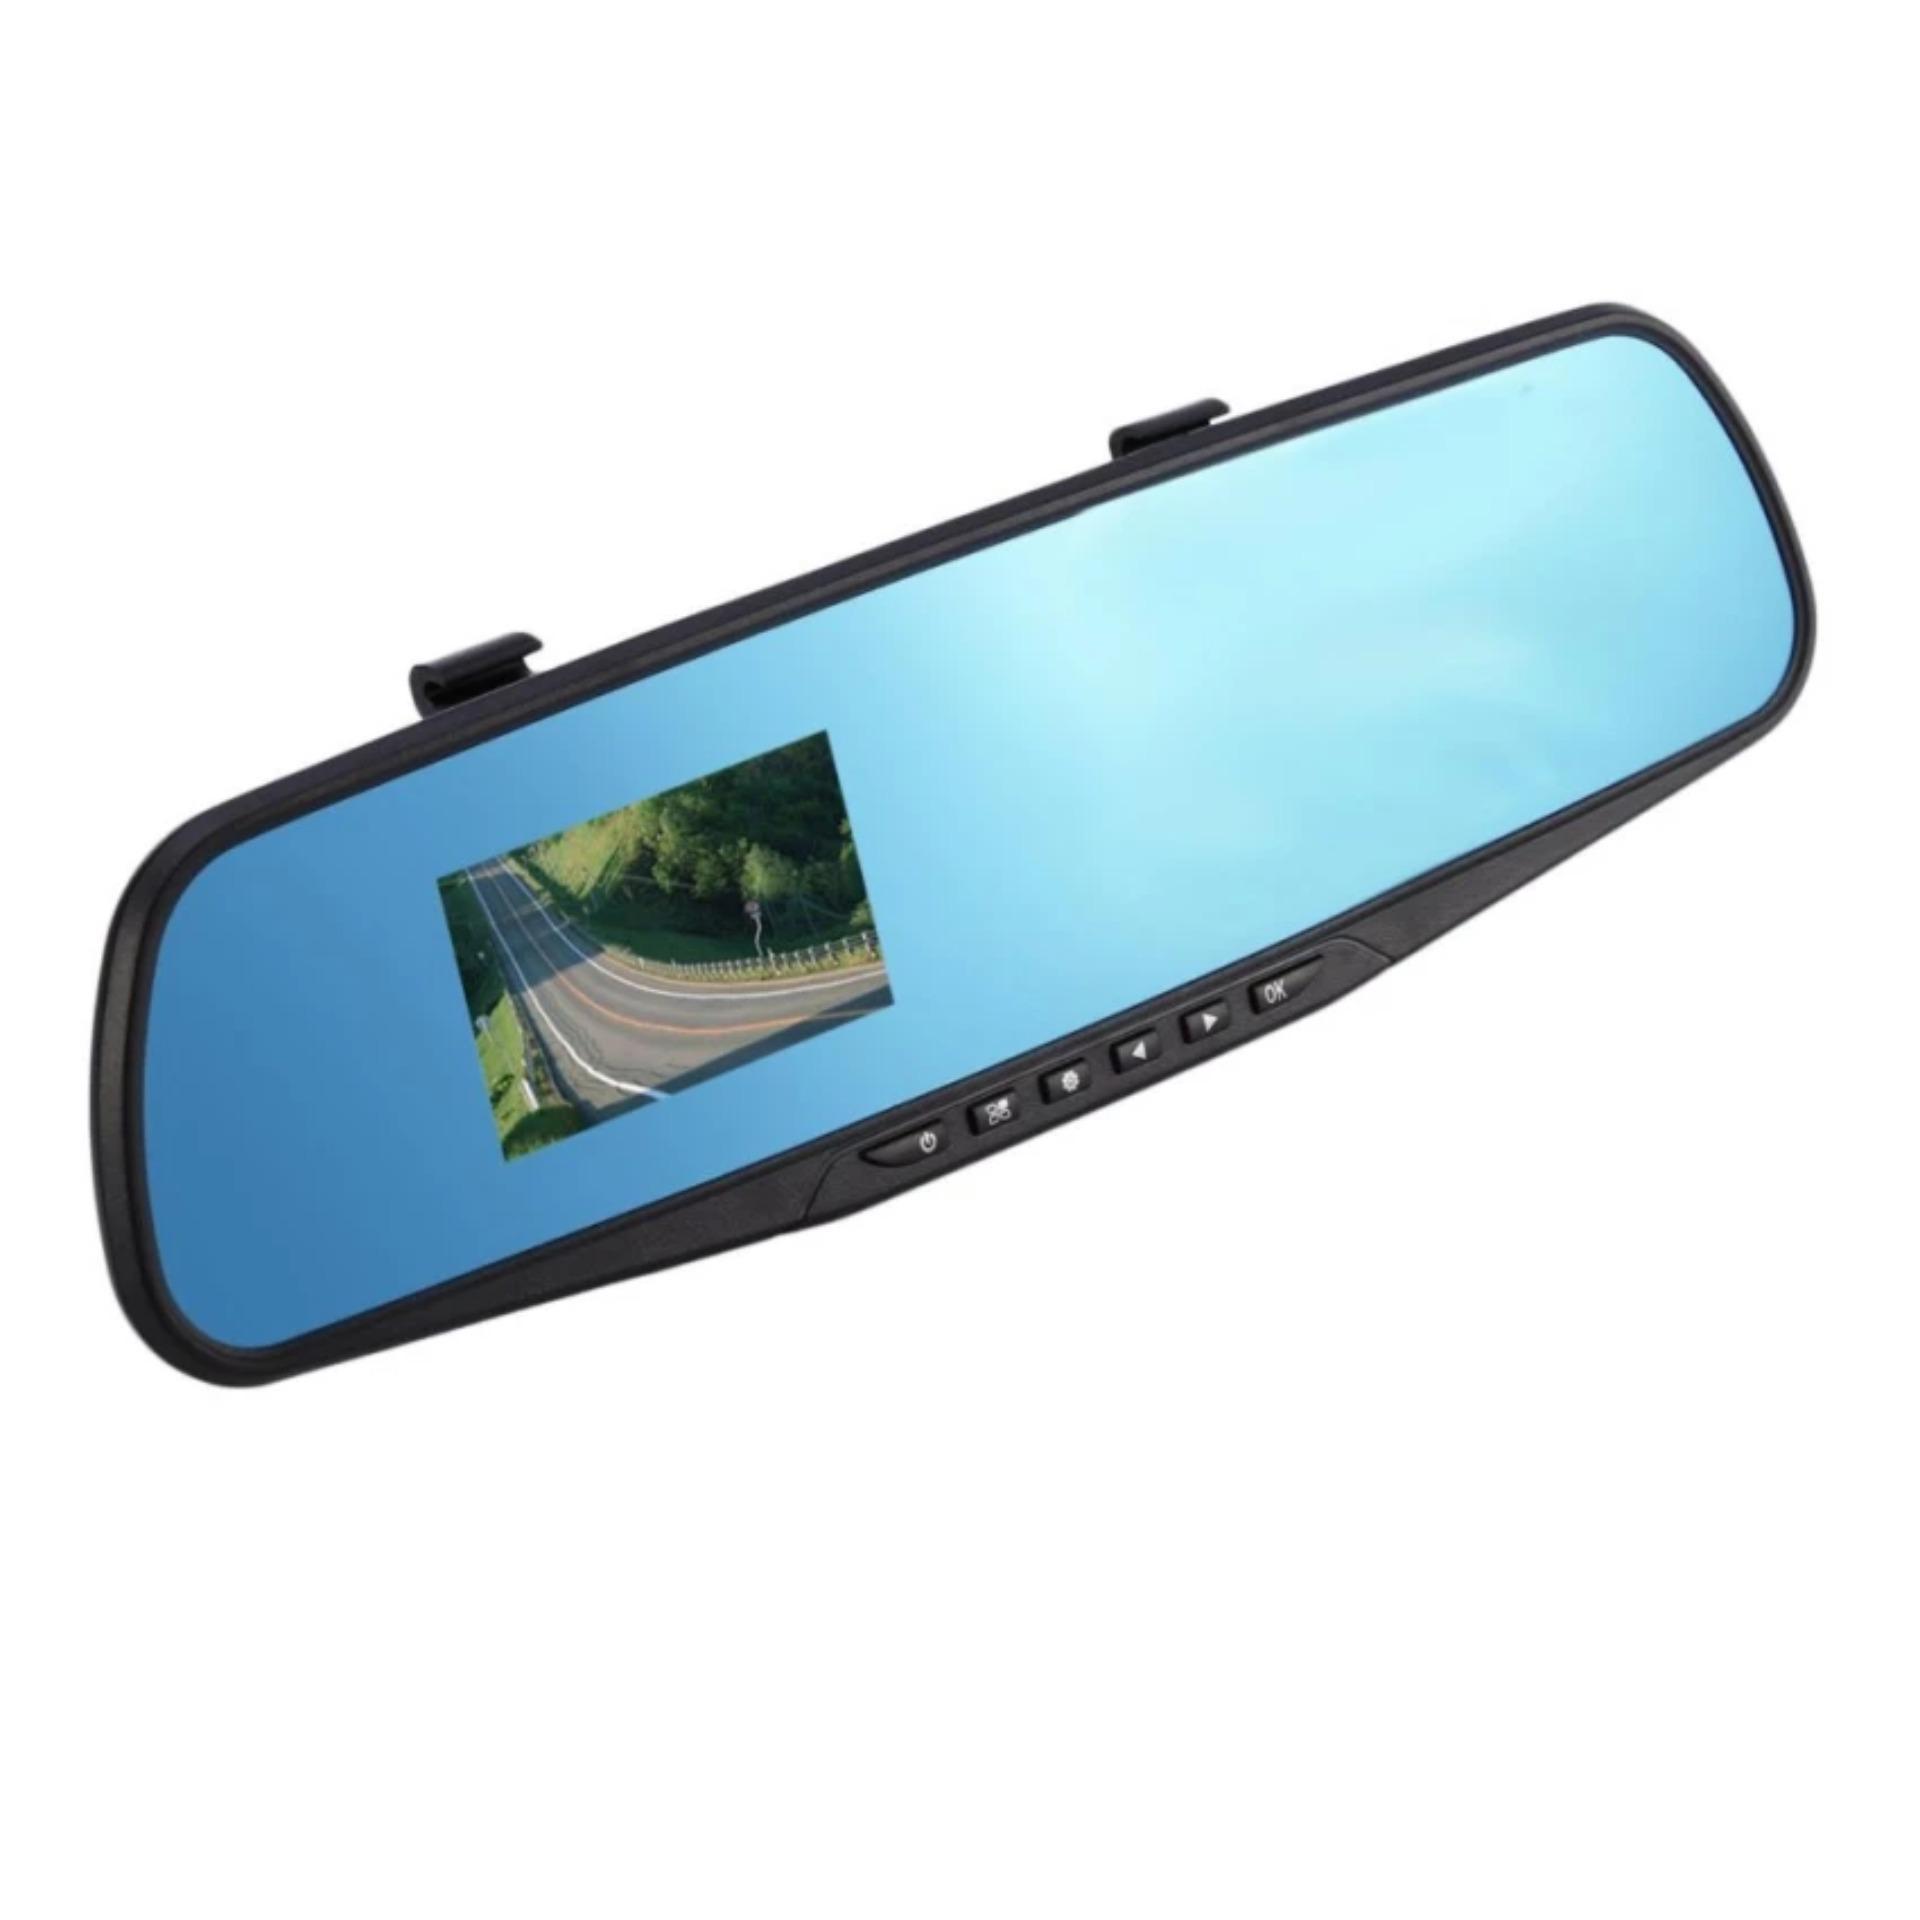 H-99 LCD HD Car DVR Car Camera Dash Cam Video Recorder RearviewMirror Vehicle DVR